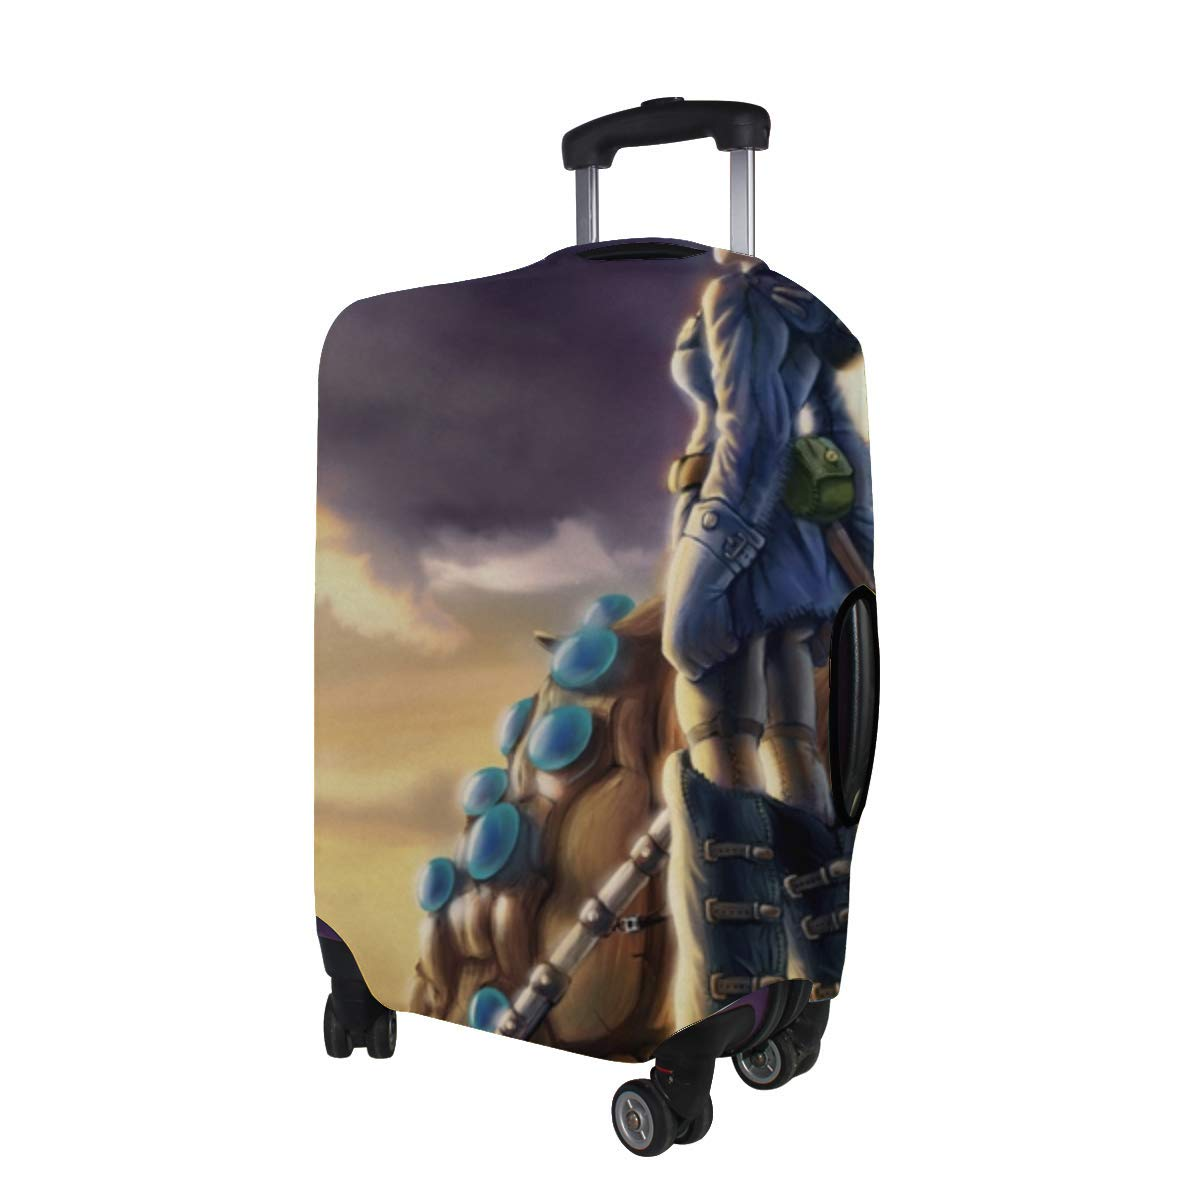 Maxm Kaze No Tani No Naushika Nausicaa Girl Pattern Print Travel Luggage Protector Baggage Suitcase Cover Fits 18-21 Inch Luggage